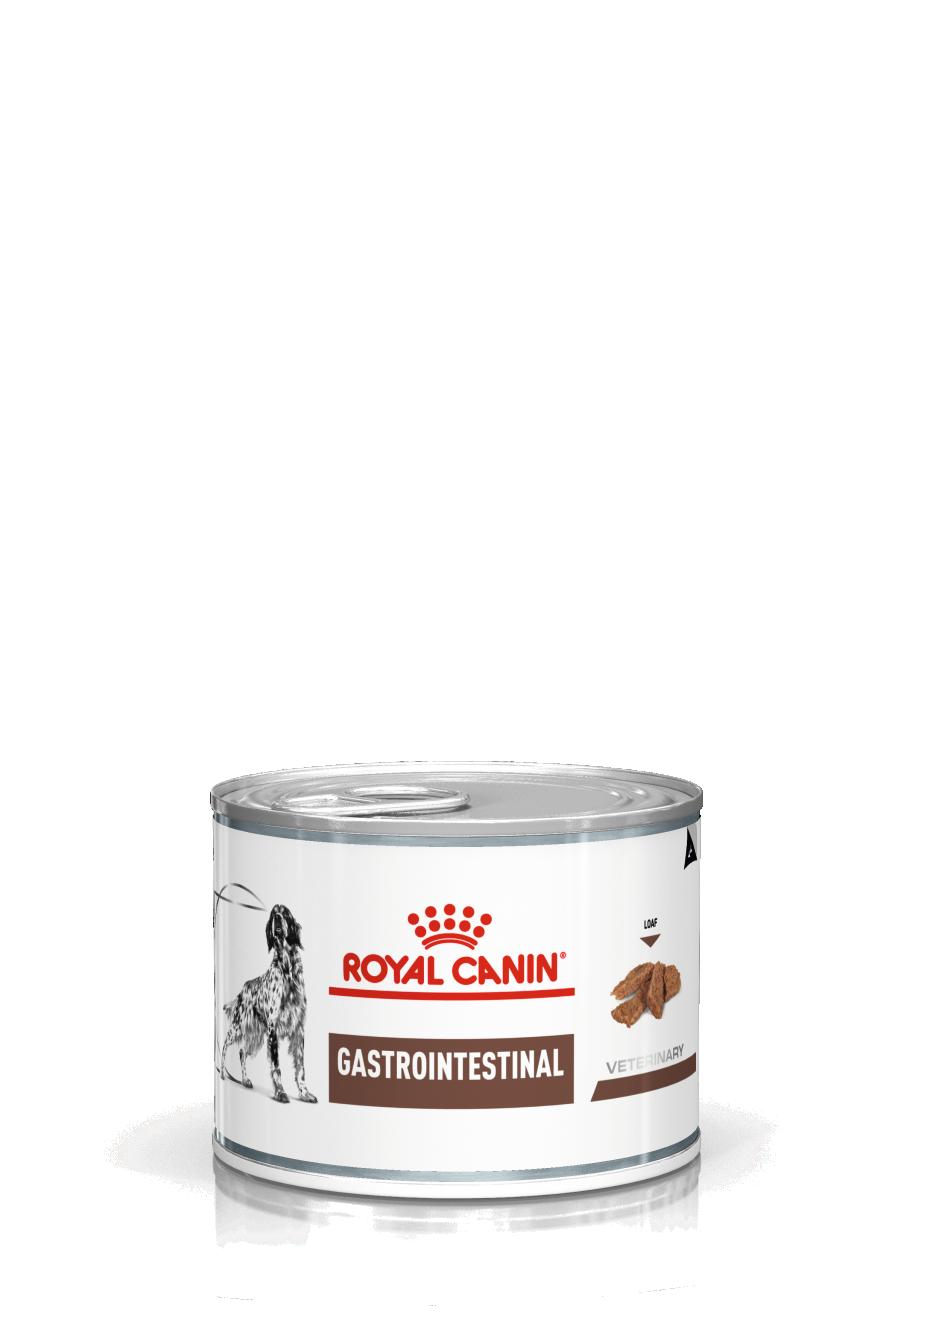 Royal Canin Gastrointestinal Mousse 12 Dosen je 200g